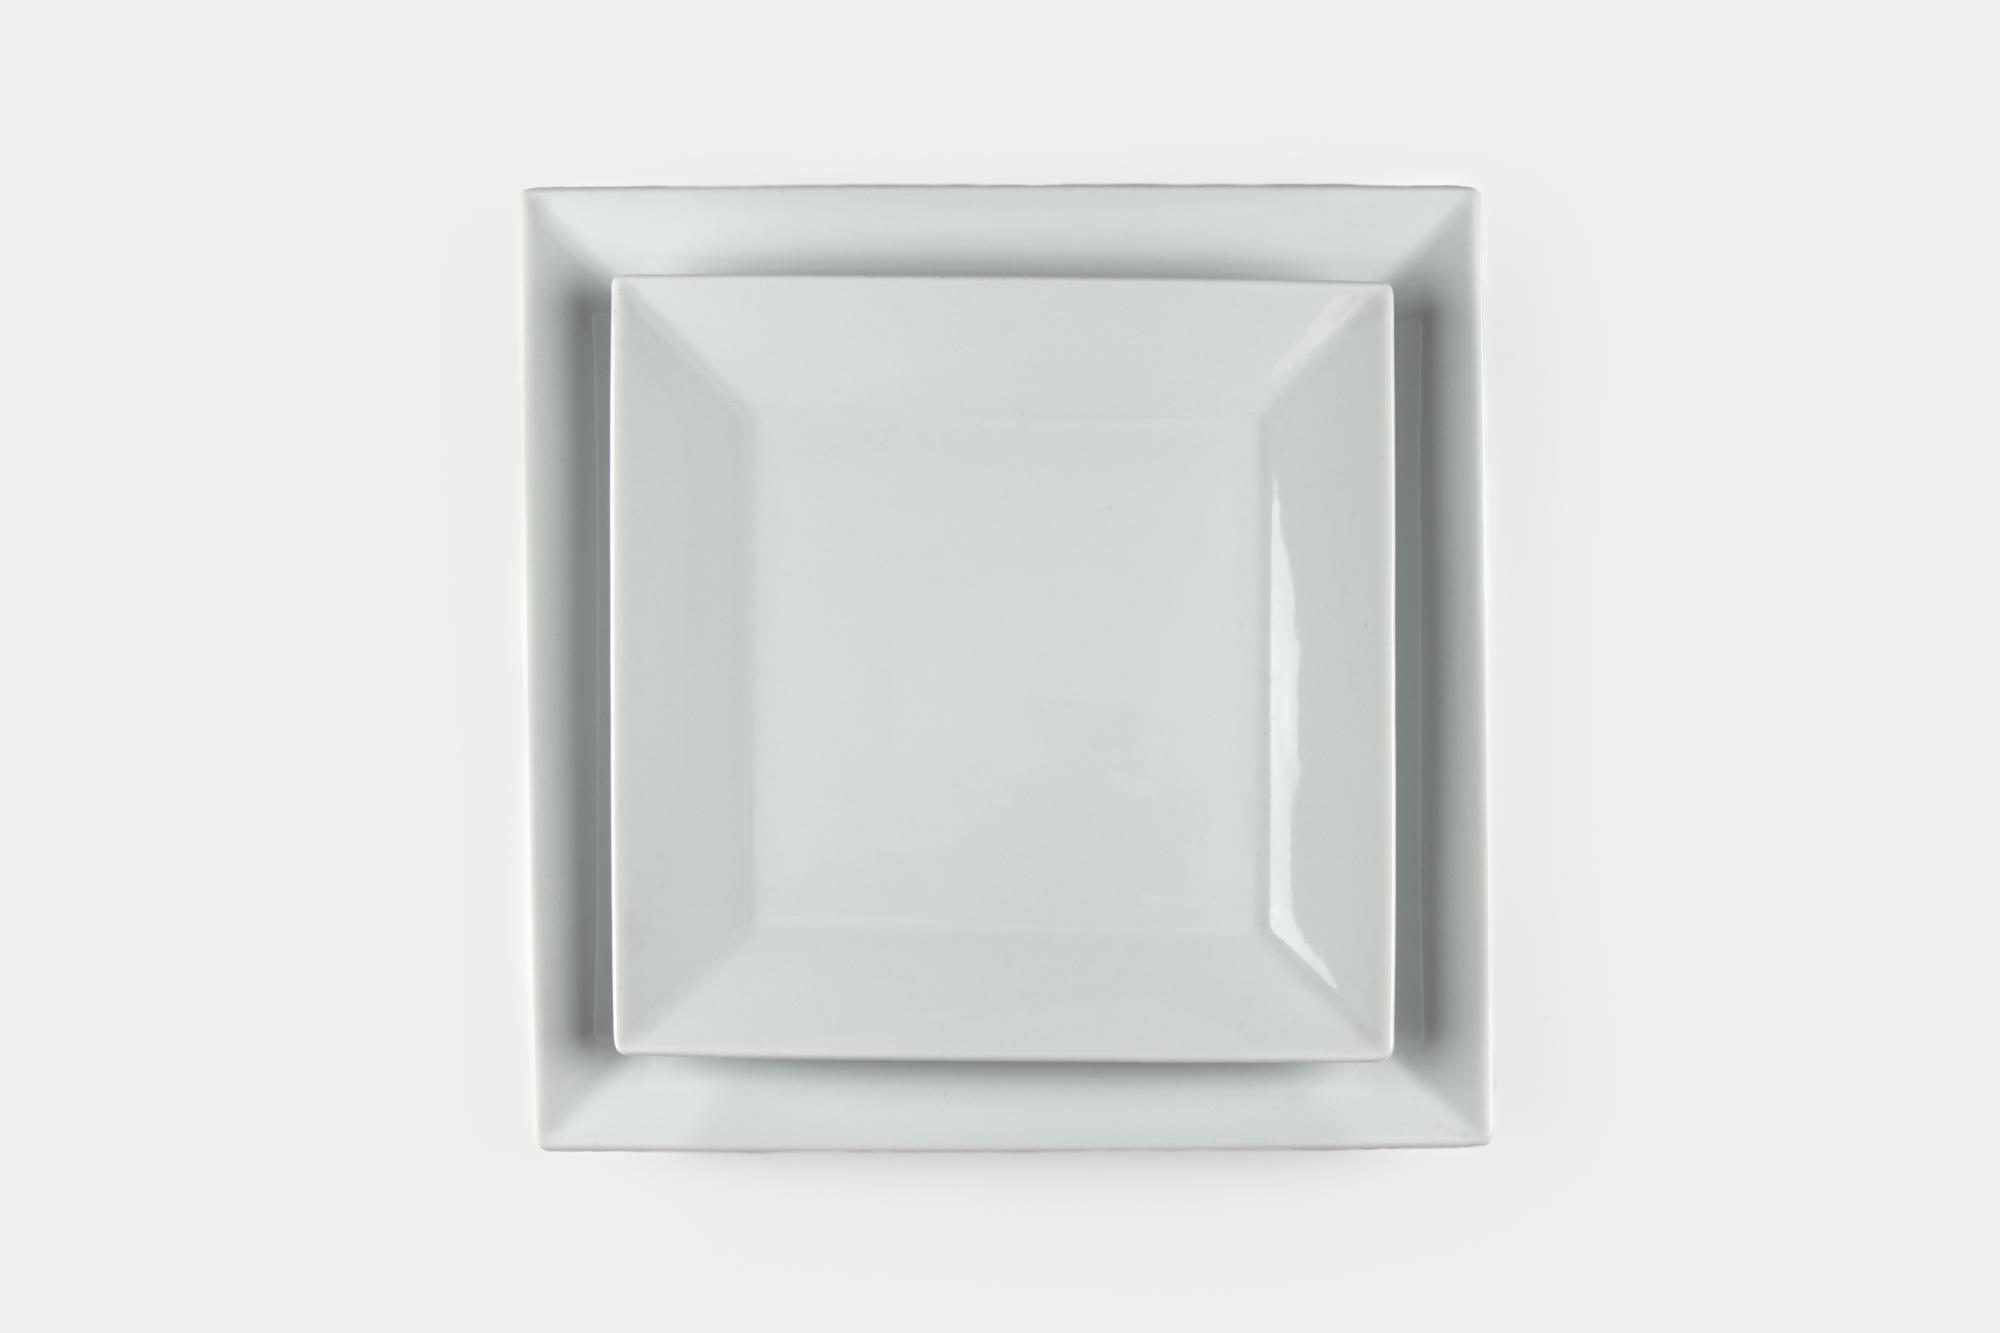 Square plate set - Image 2